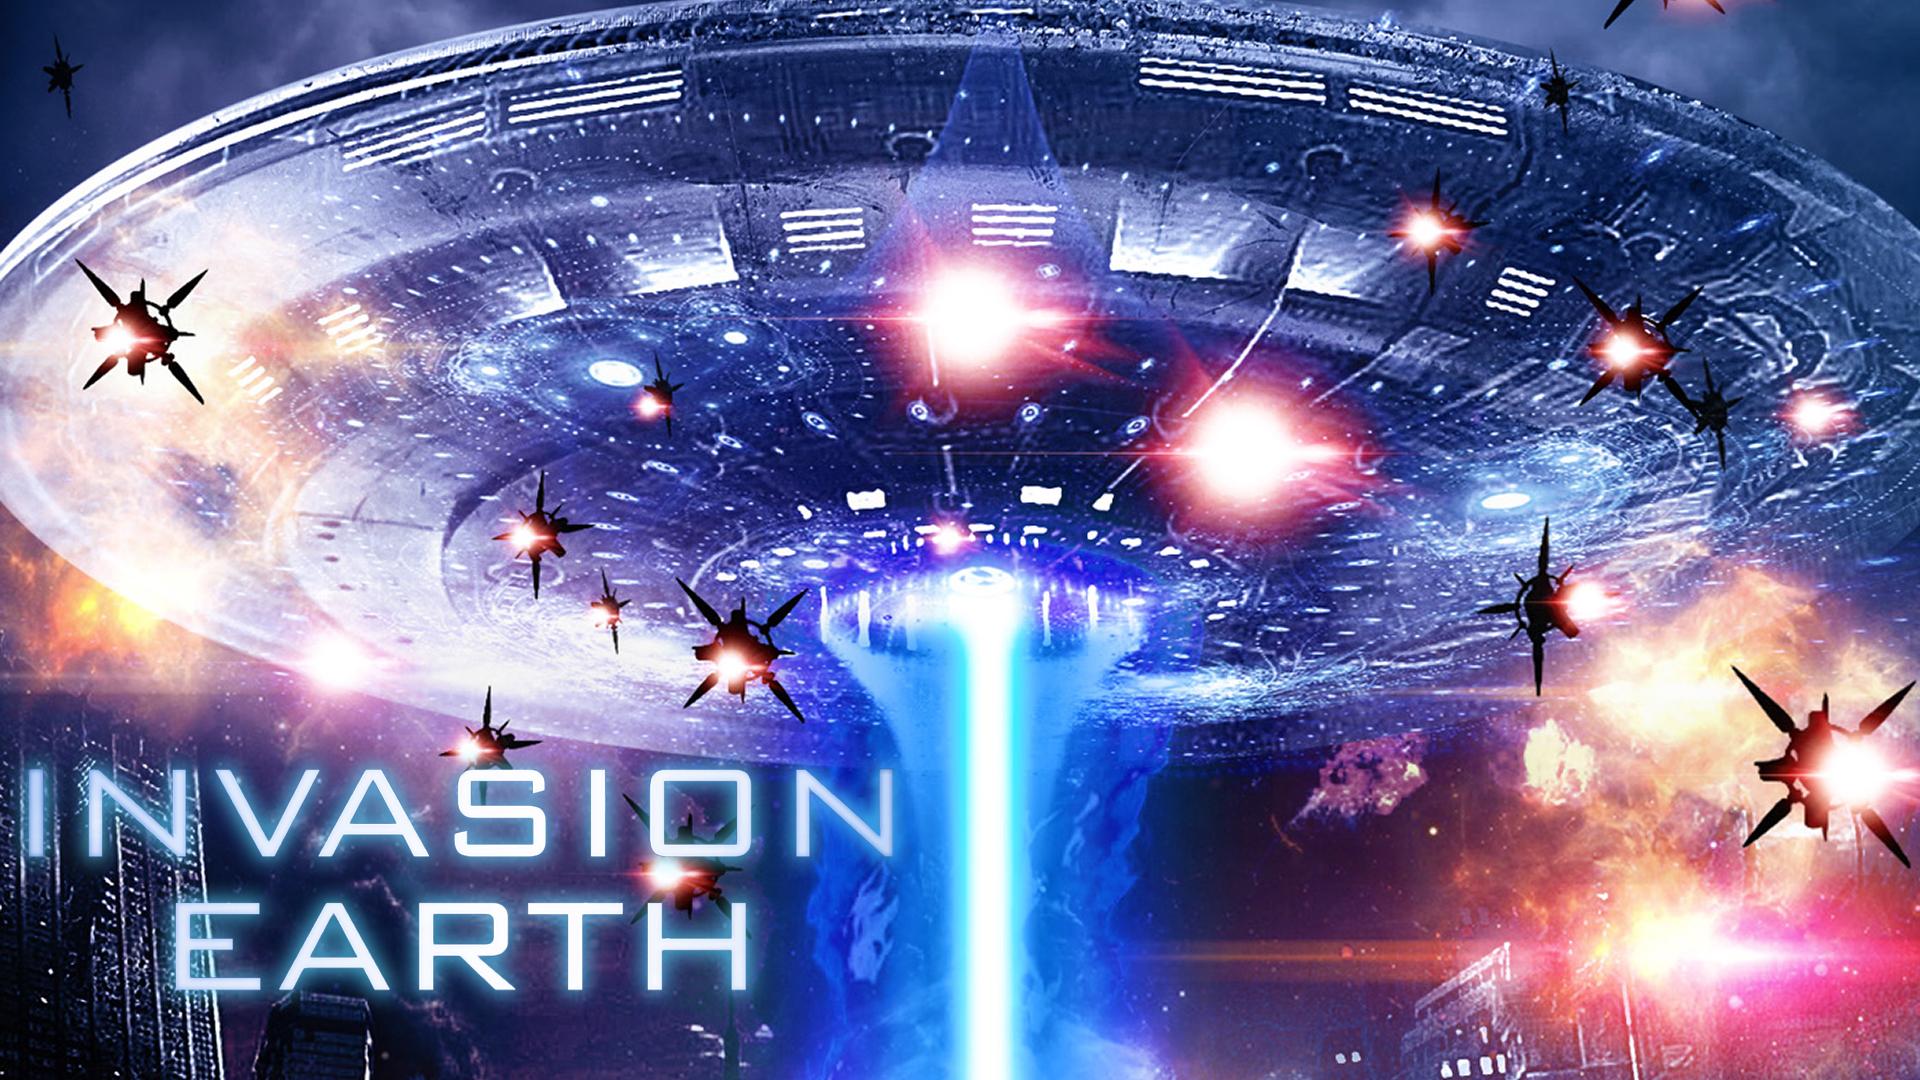 Invasion Earth